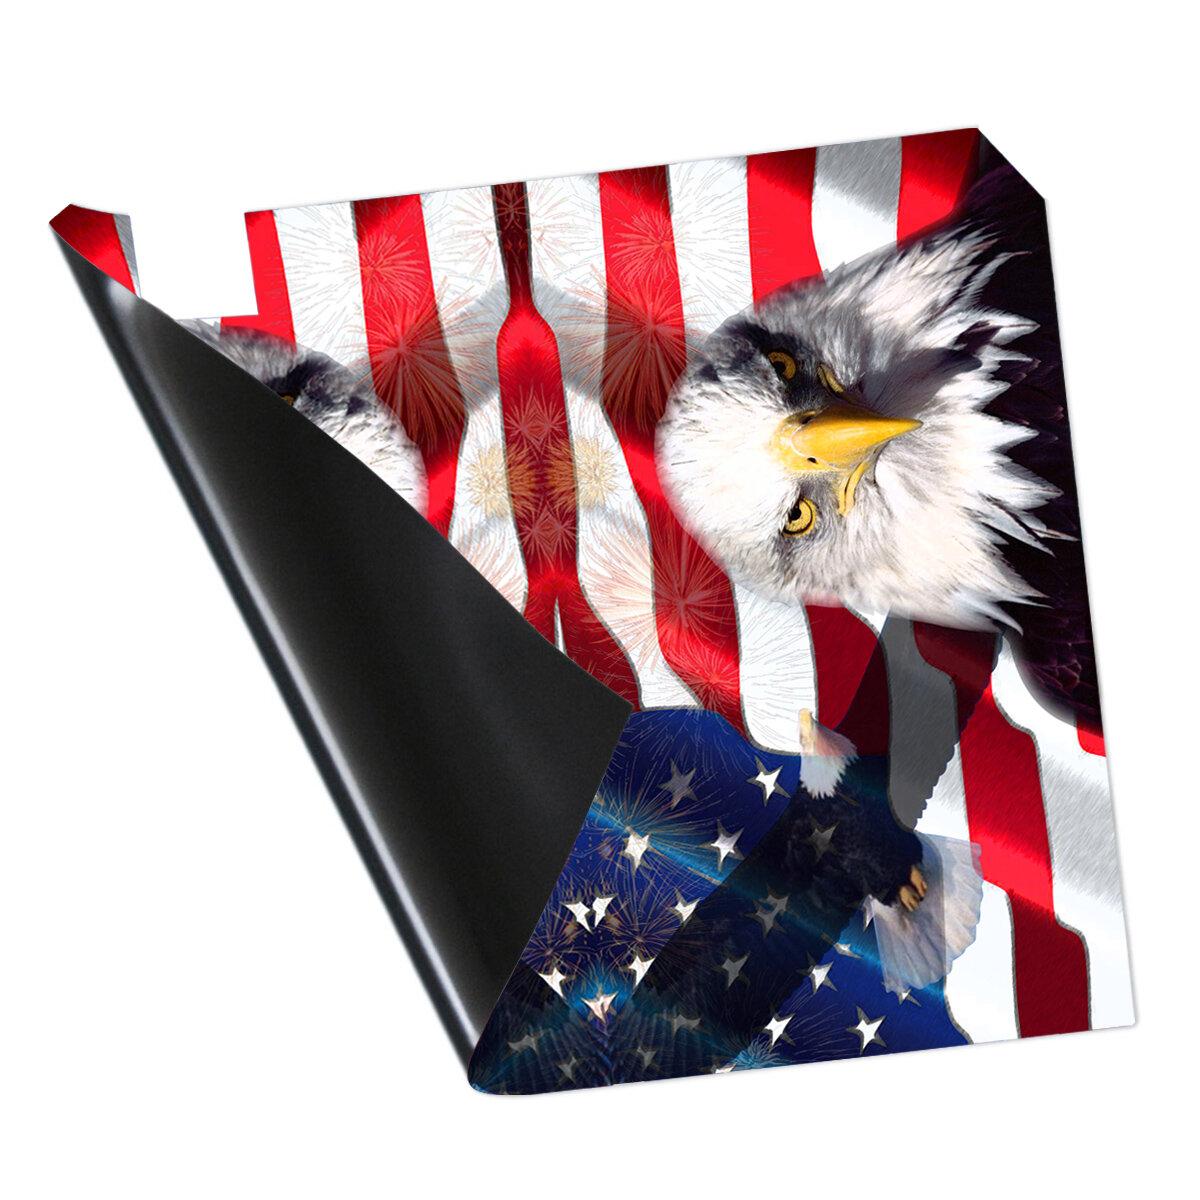 MBM22 VWAQ 4th of July Mailbox Covers Magnetic American Flag Eagle USA Patriotic Mailbox Decorative